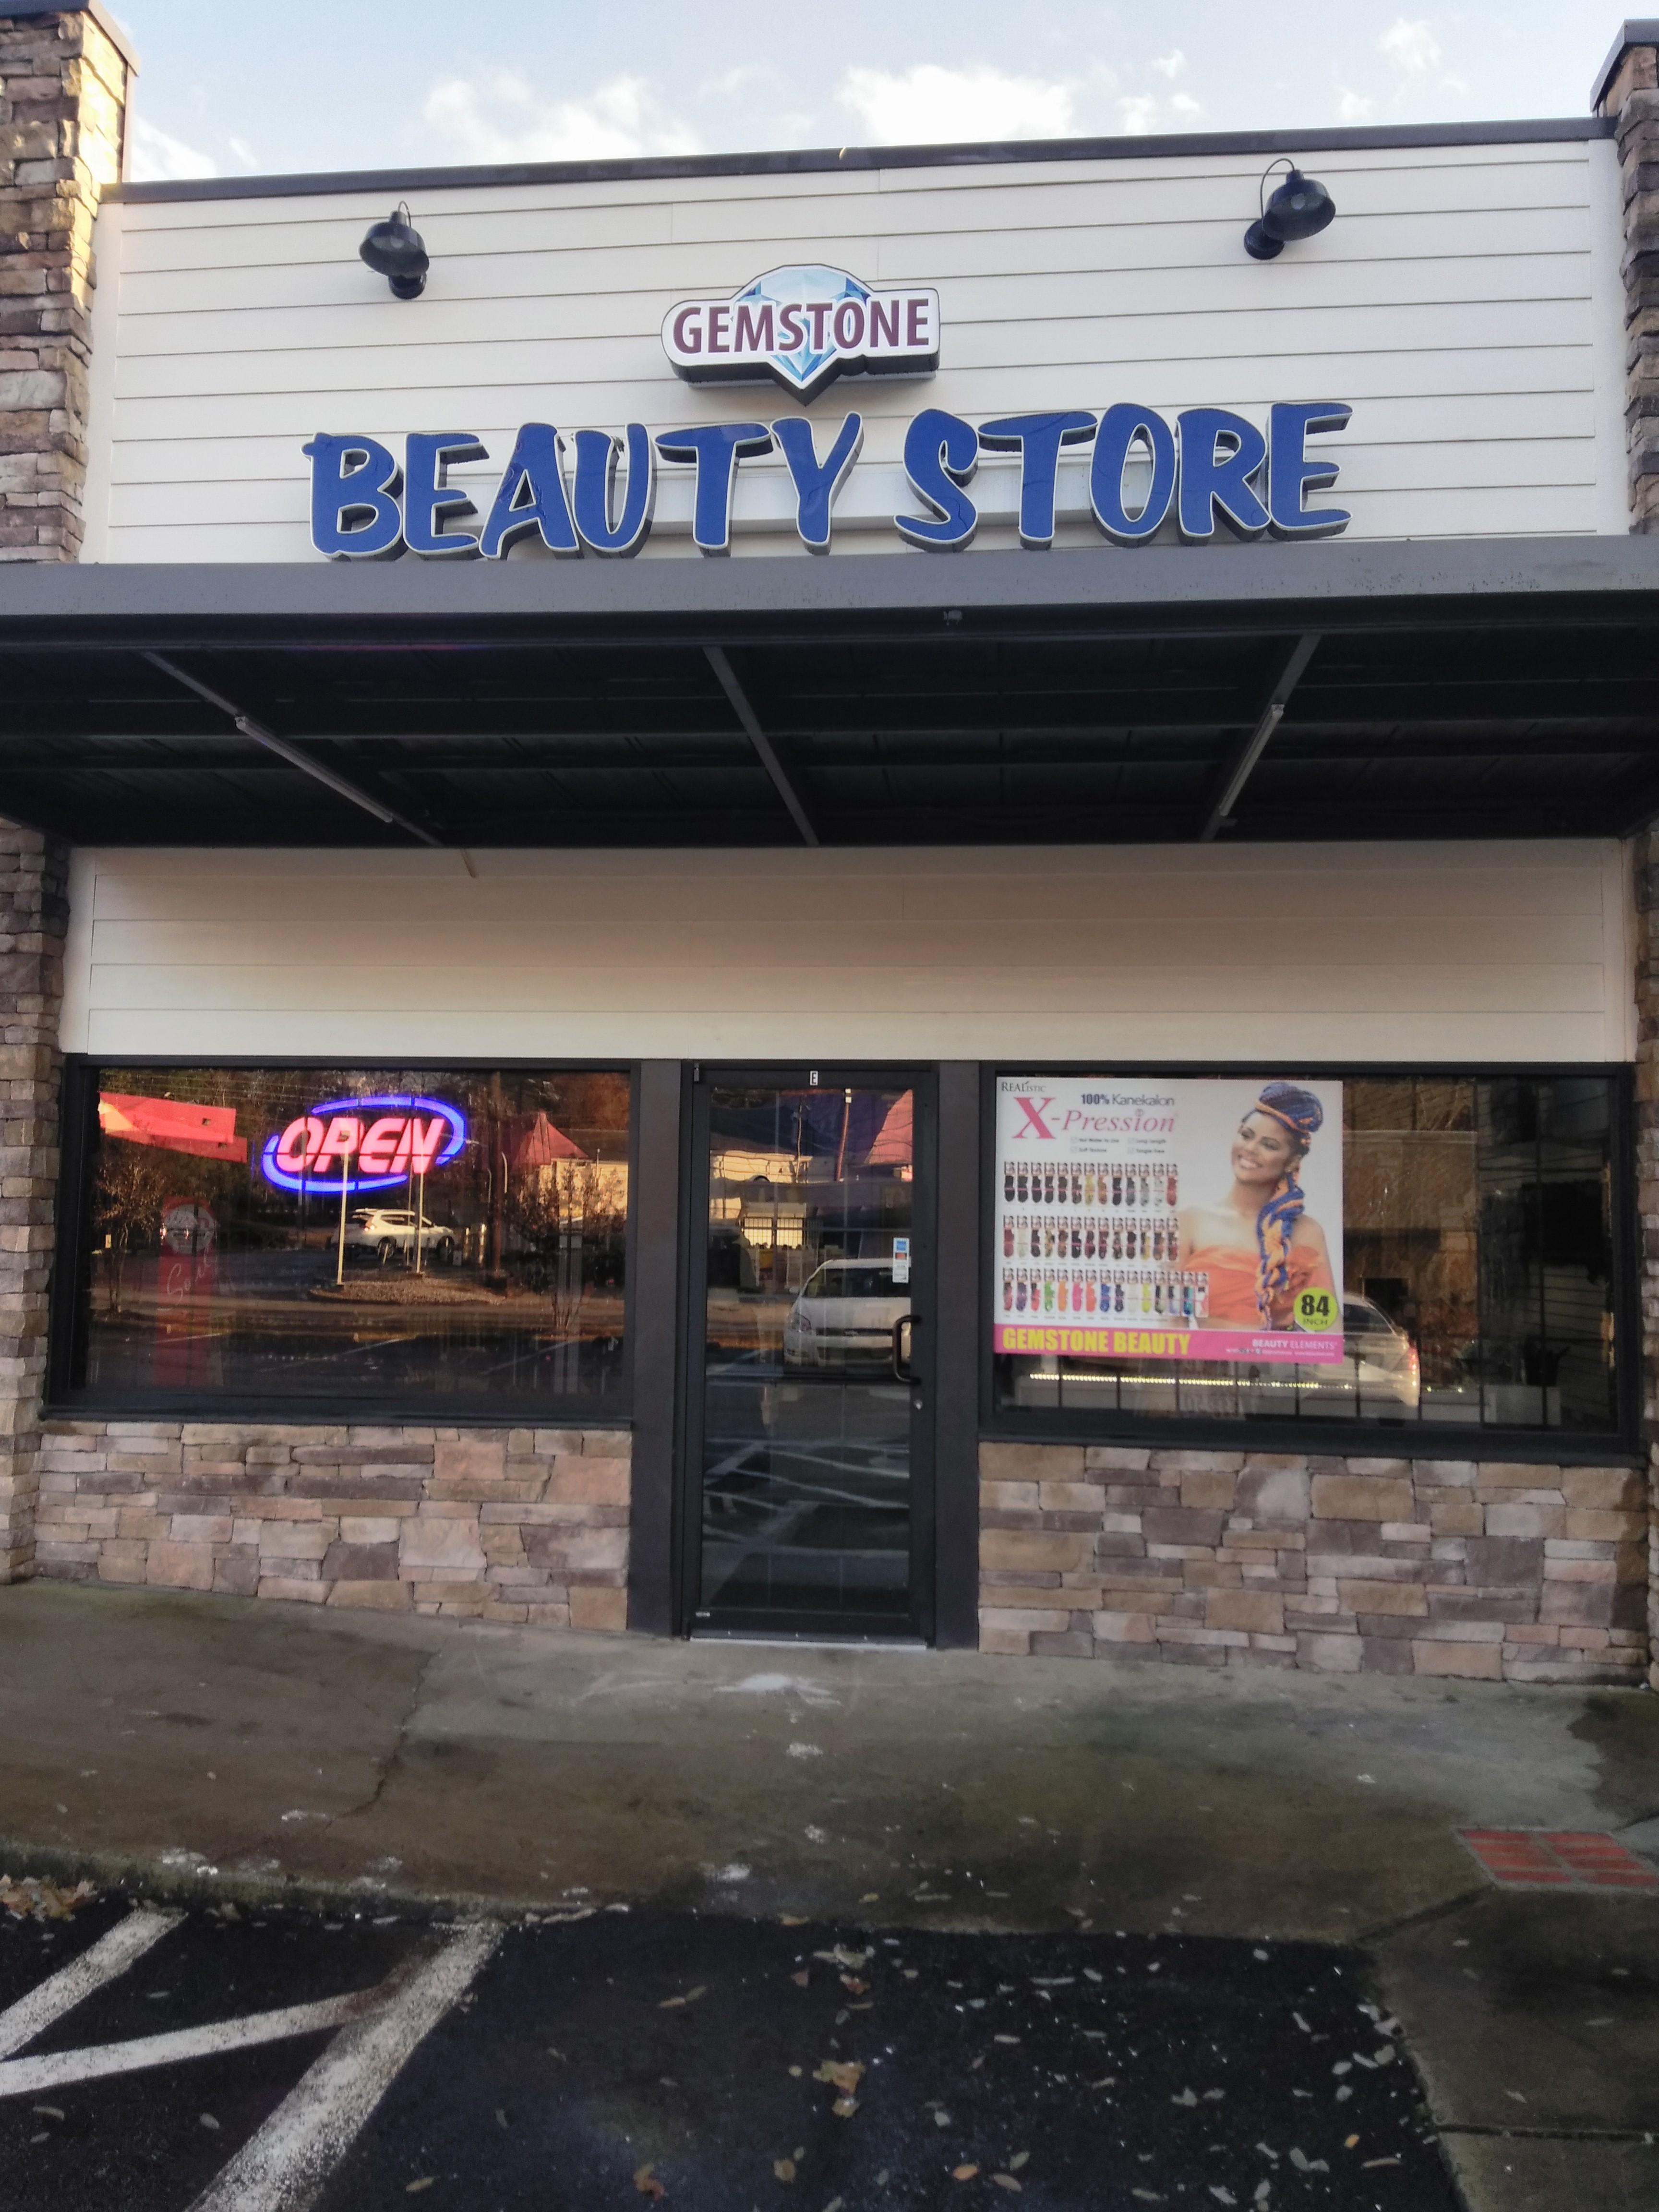 Gemstone Beauty Store